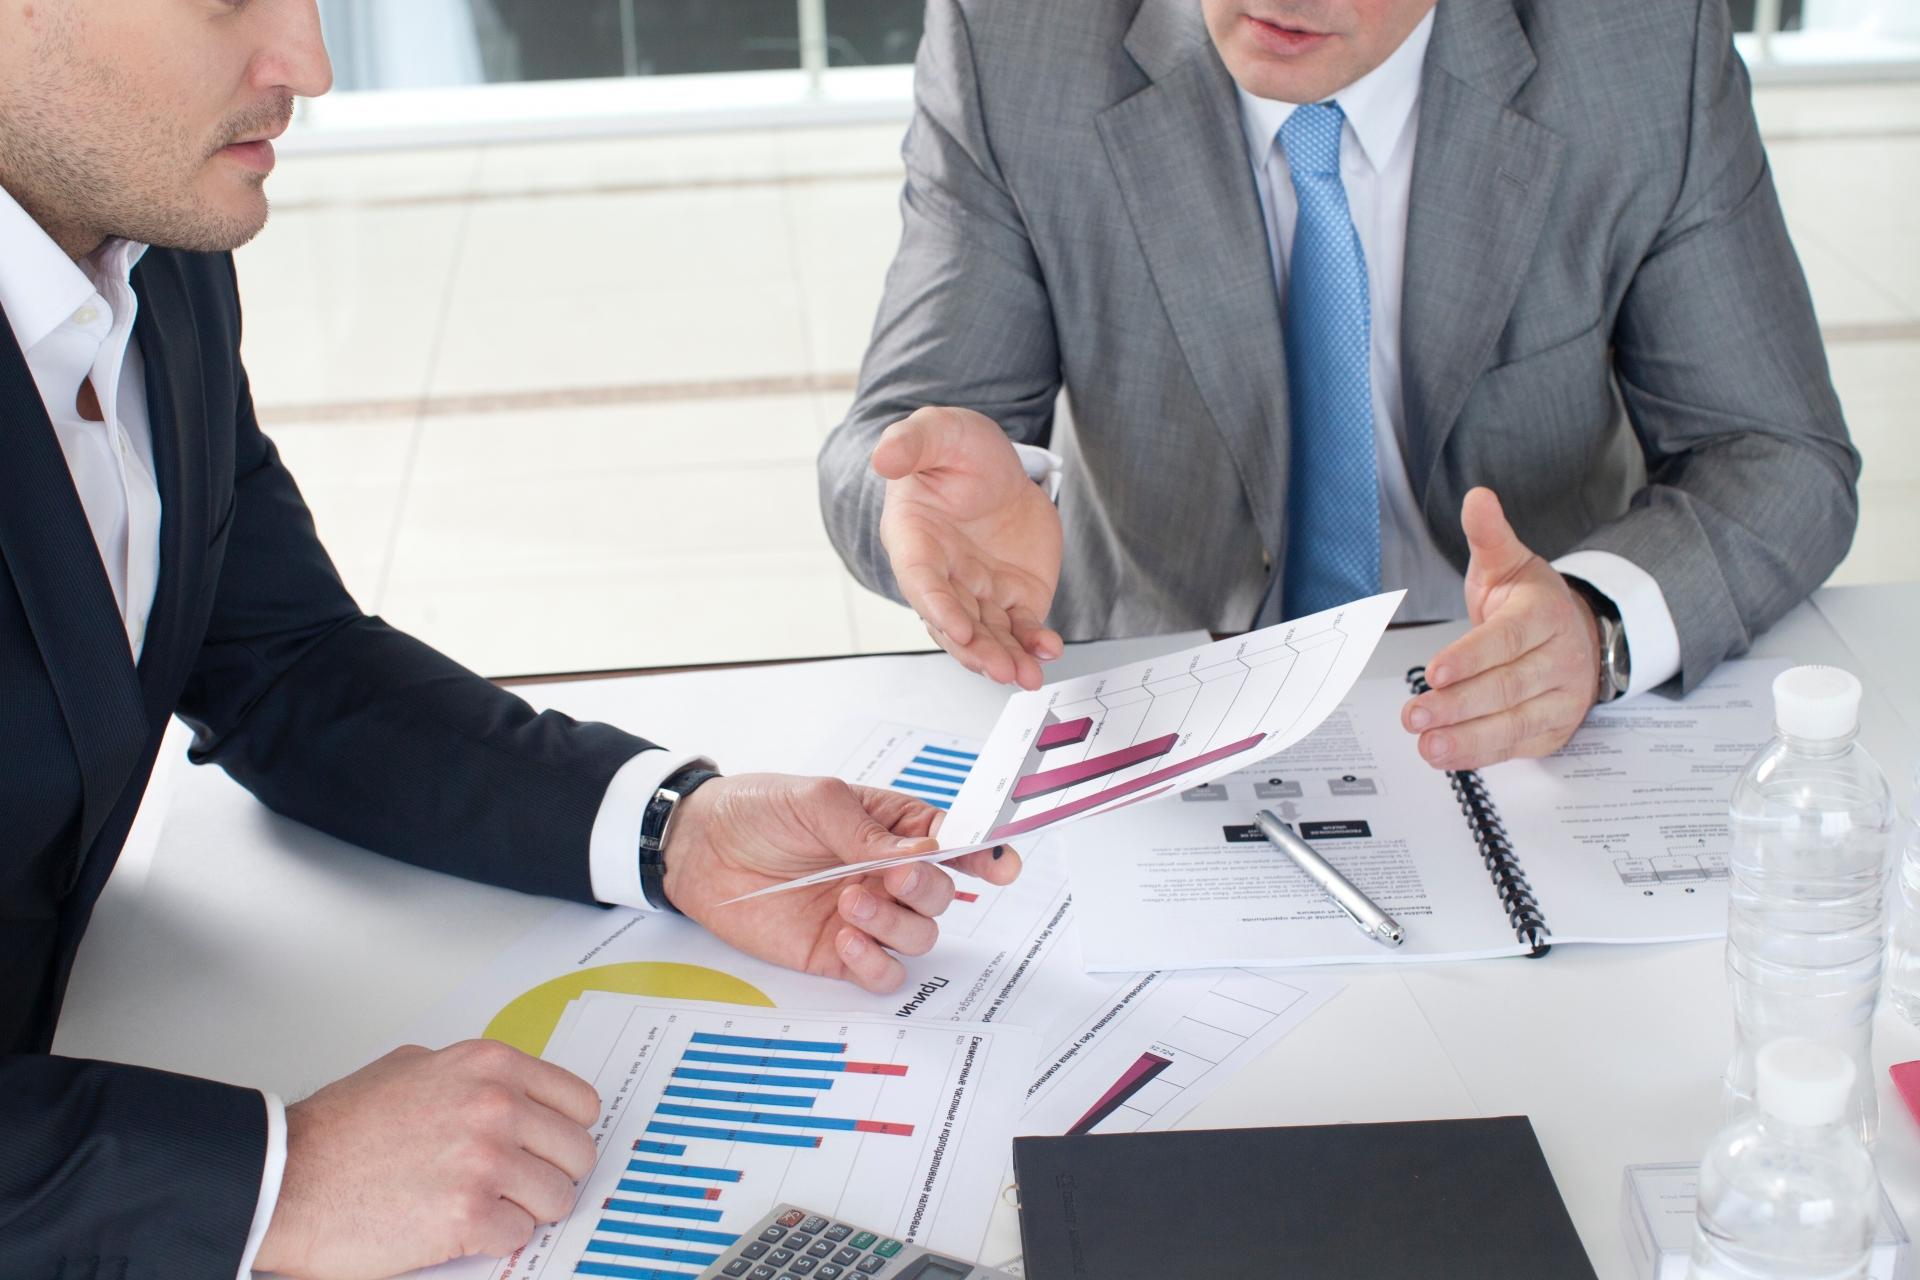 businessman-discussion-graph-data-1